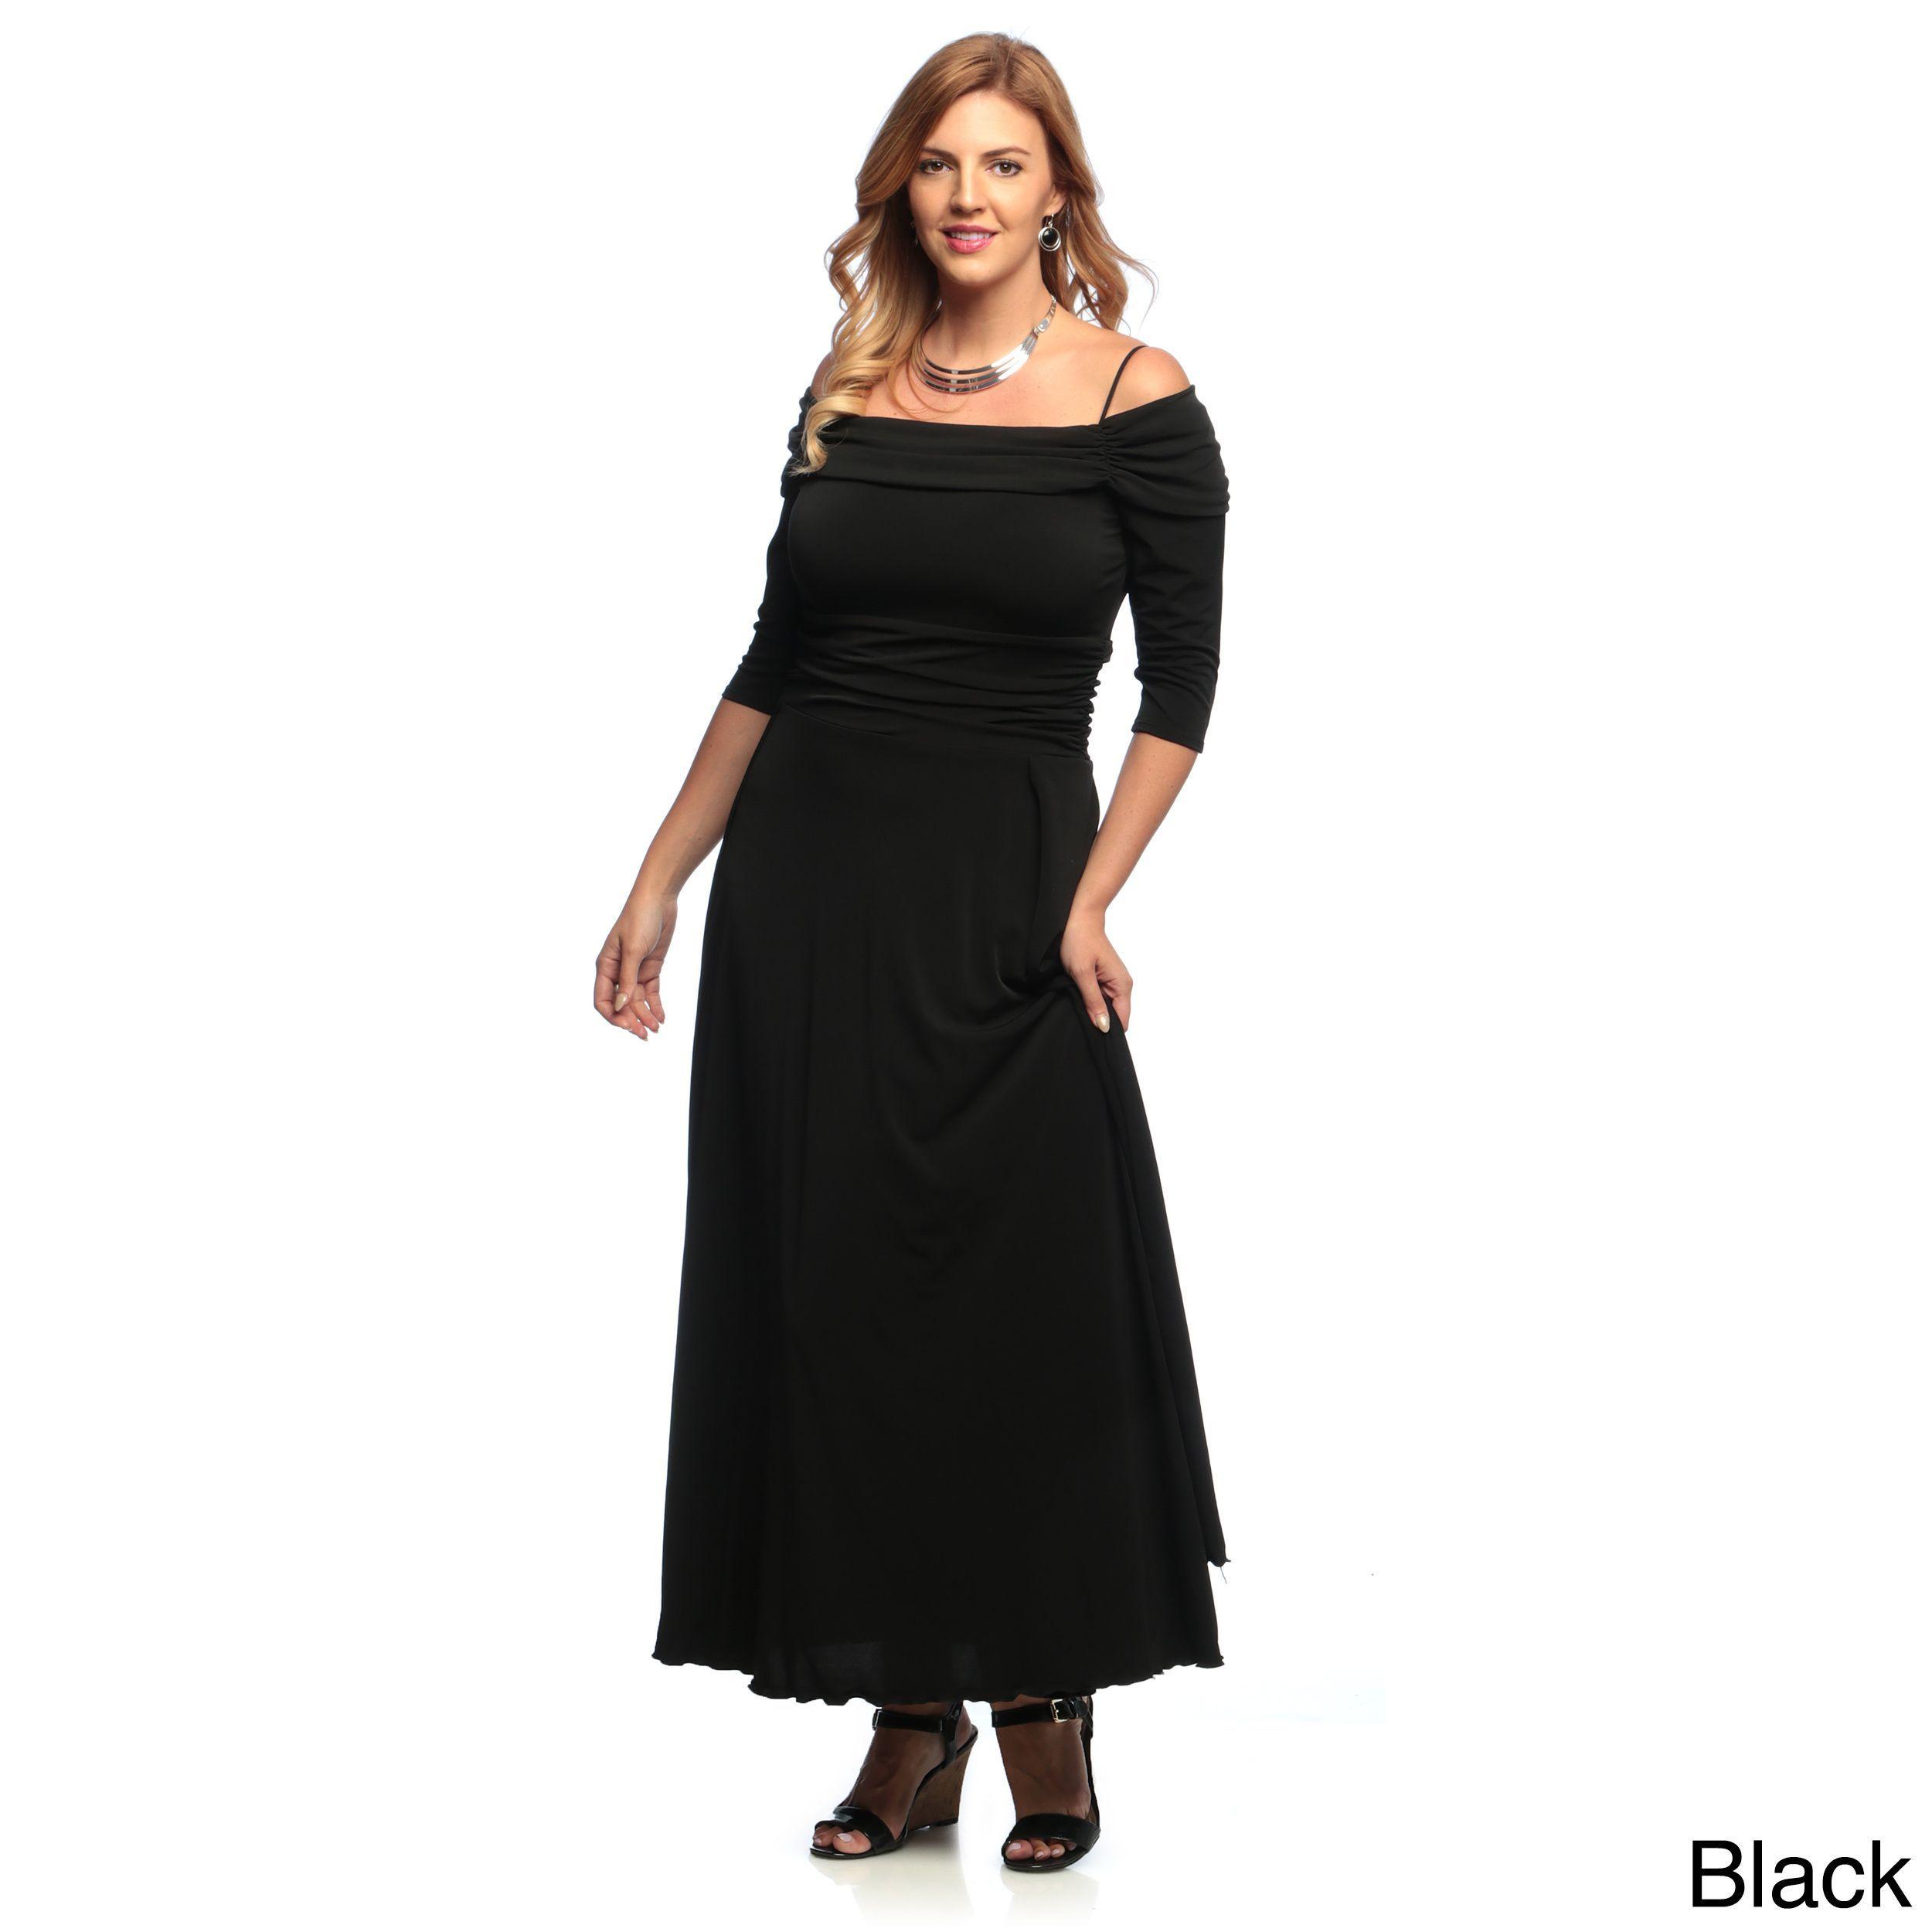 Evanese womenus plus size offtheshoulder sleeves dress x